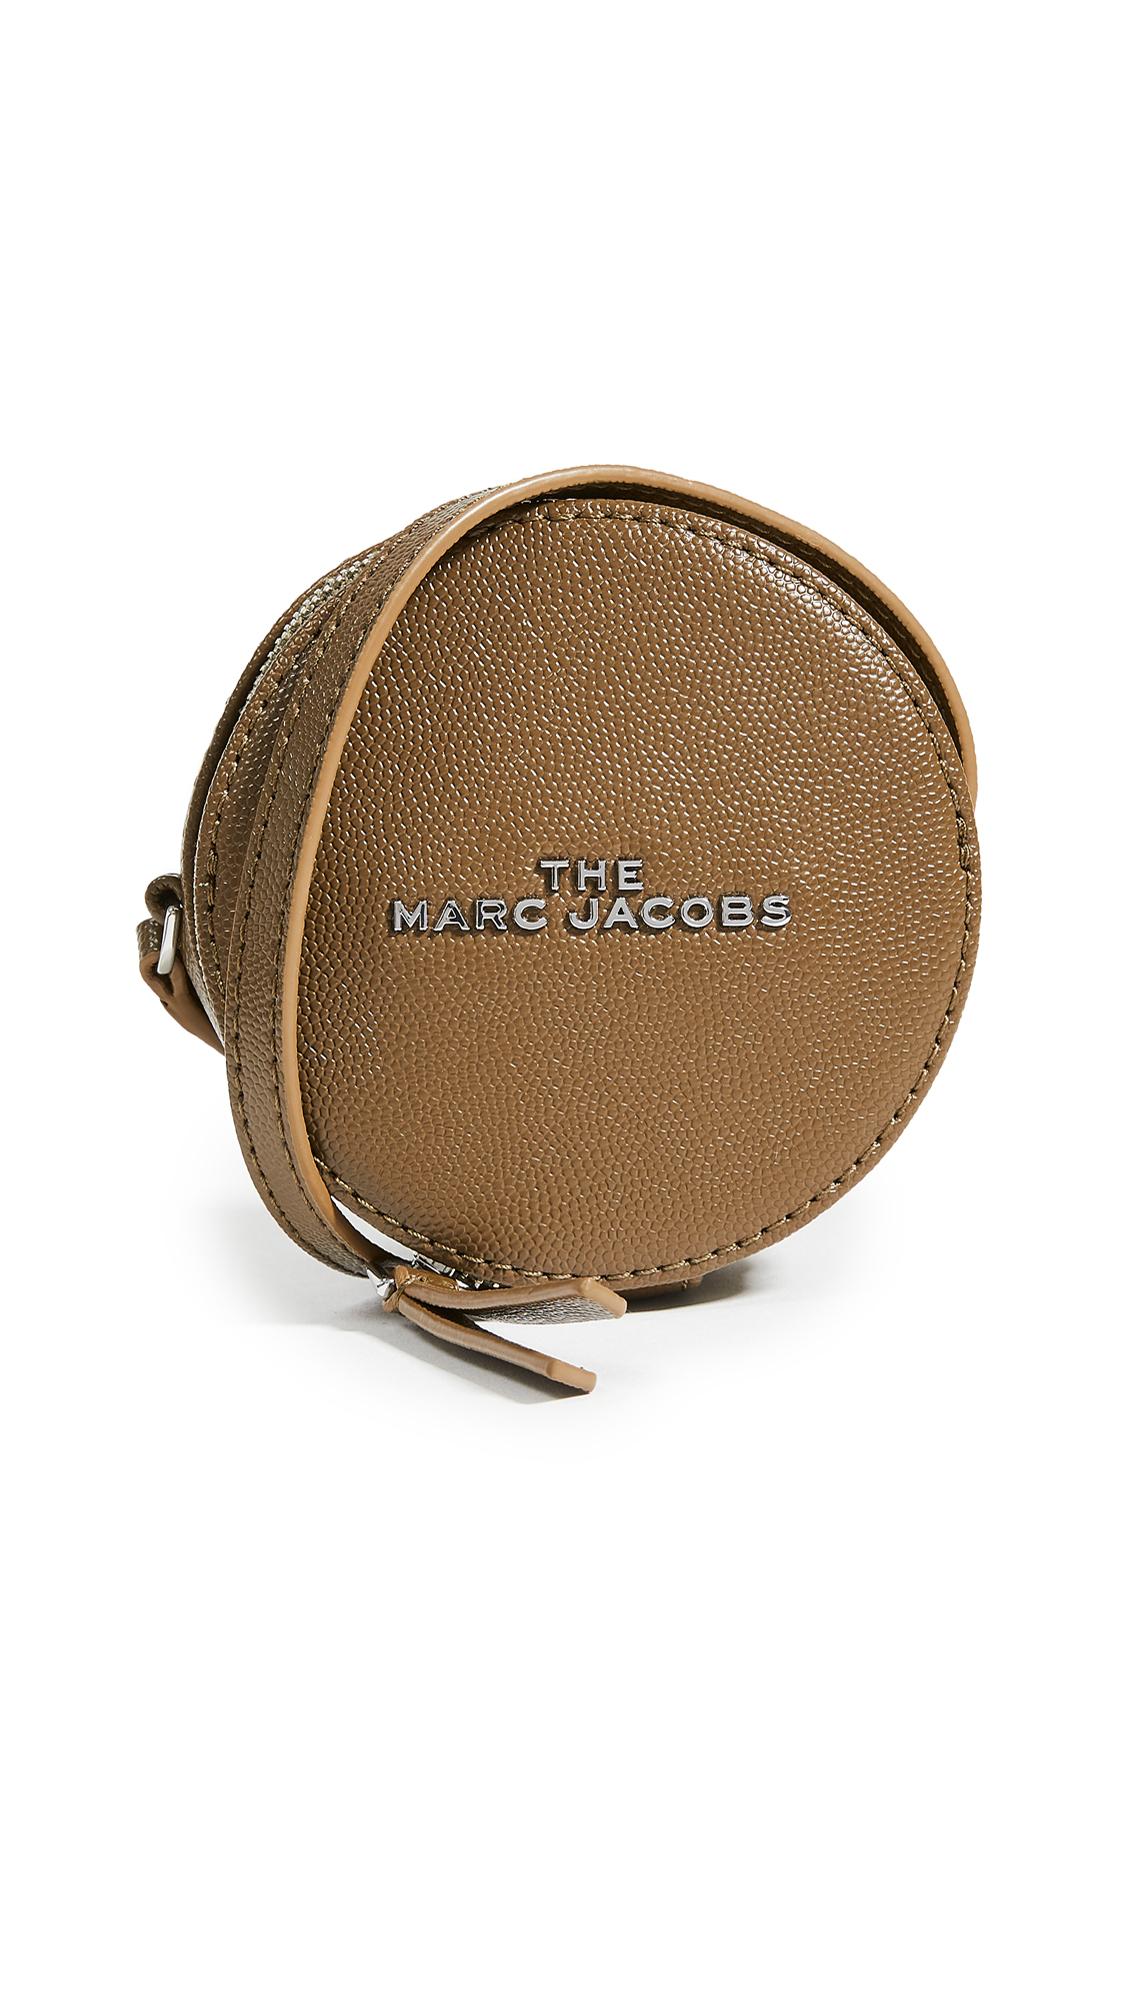 The Marc Jacobs Medium Hot Spot Wallet